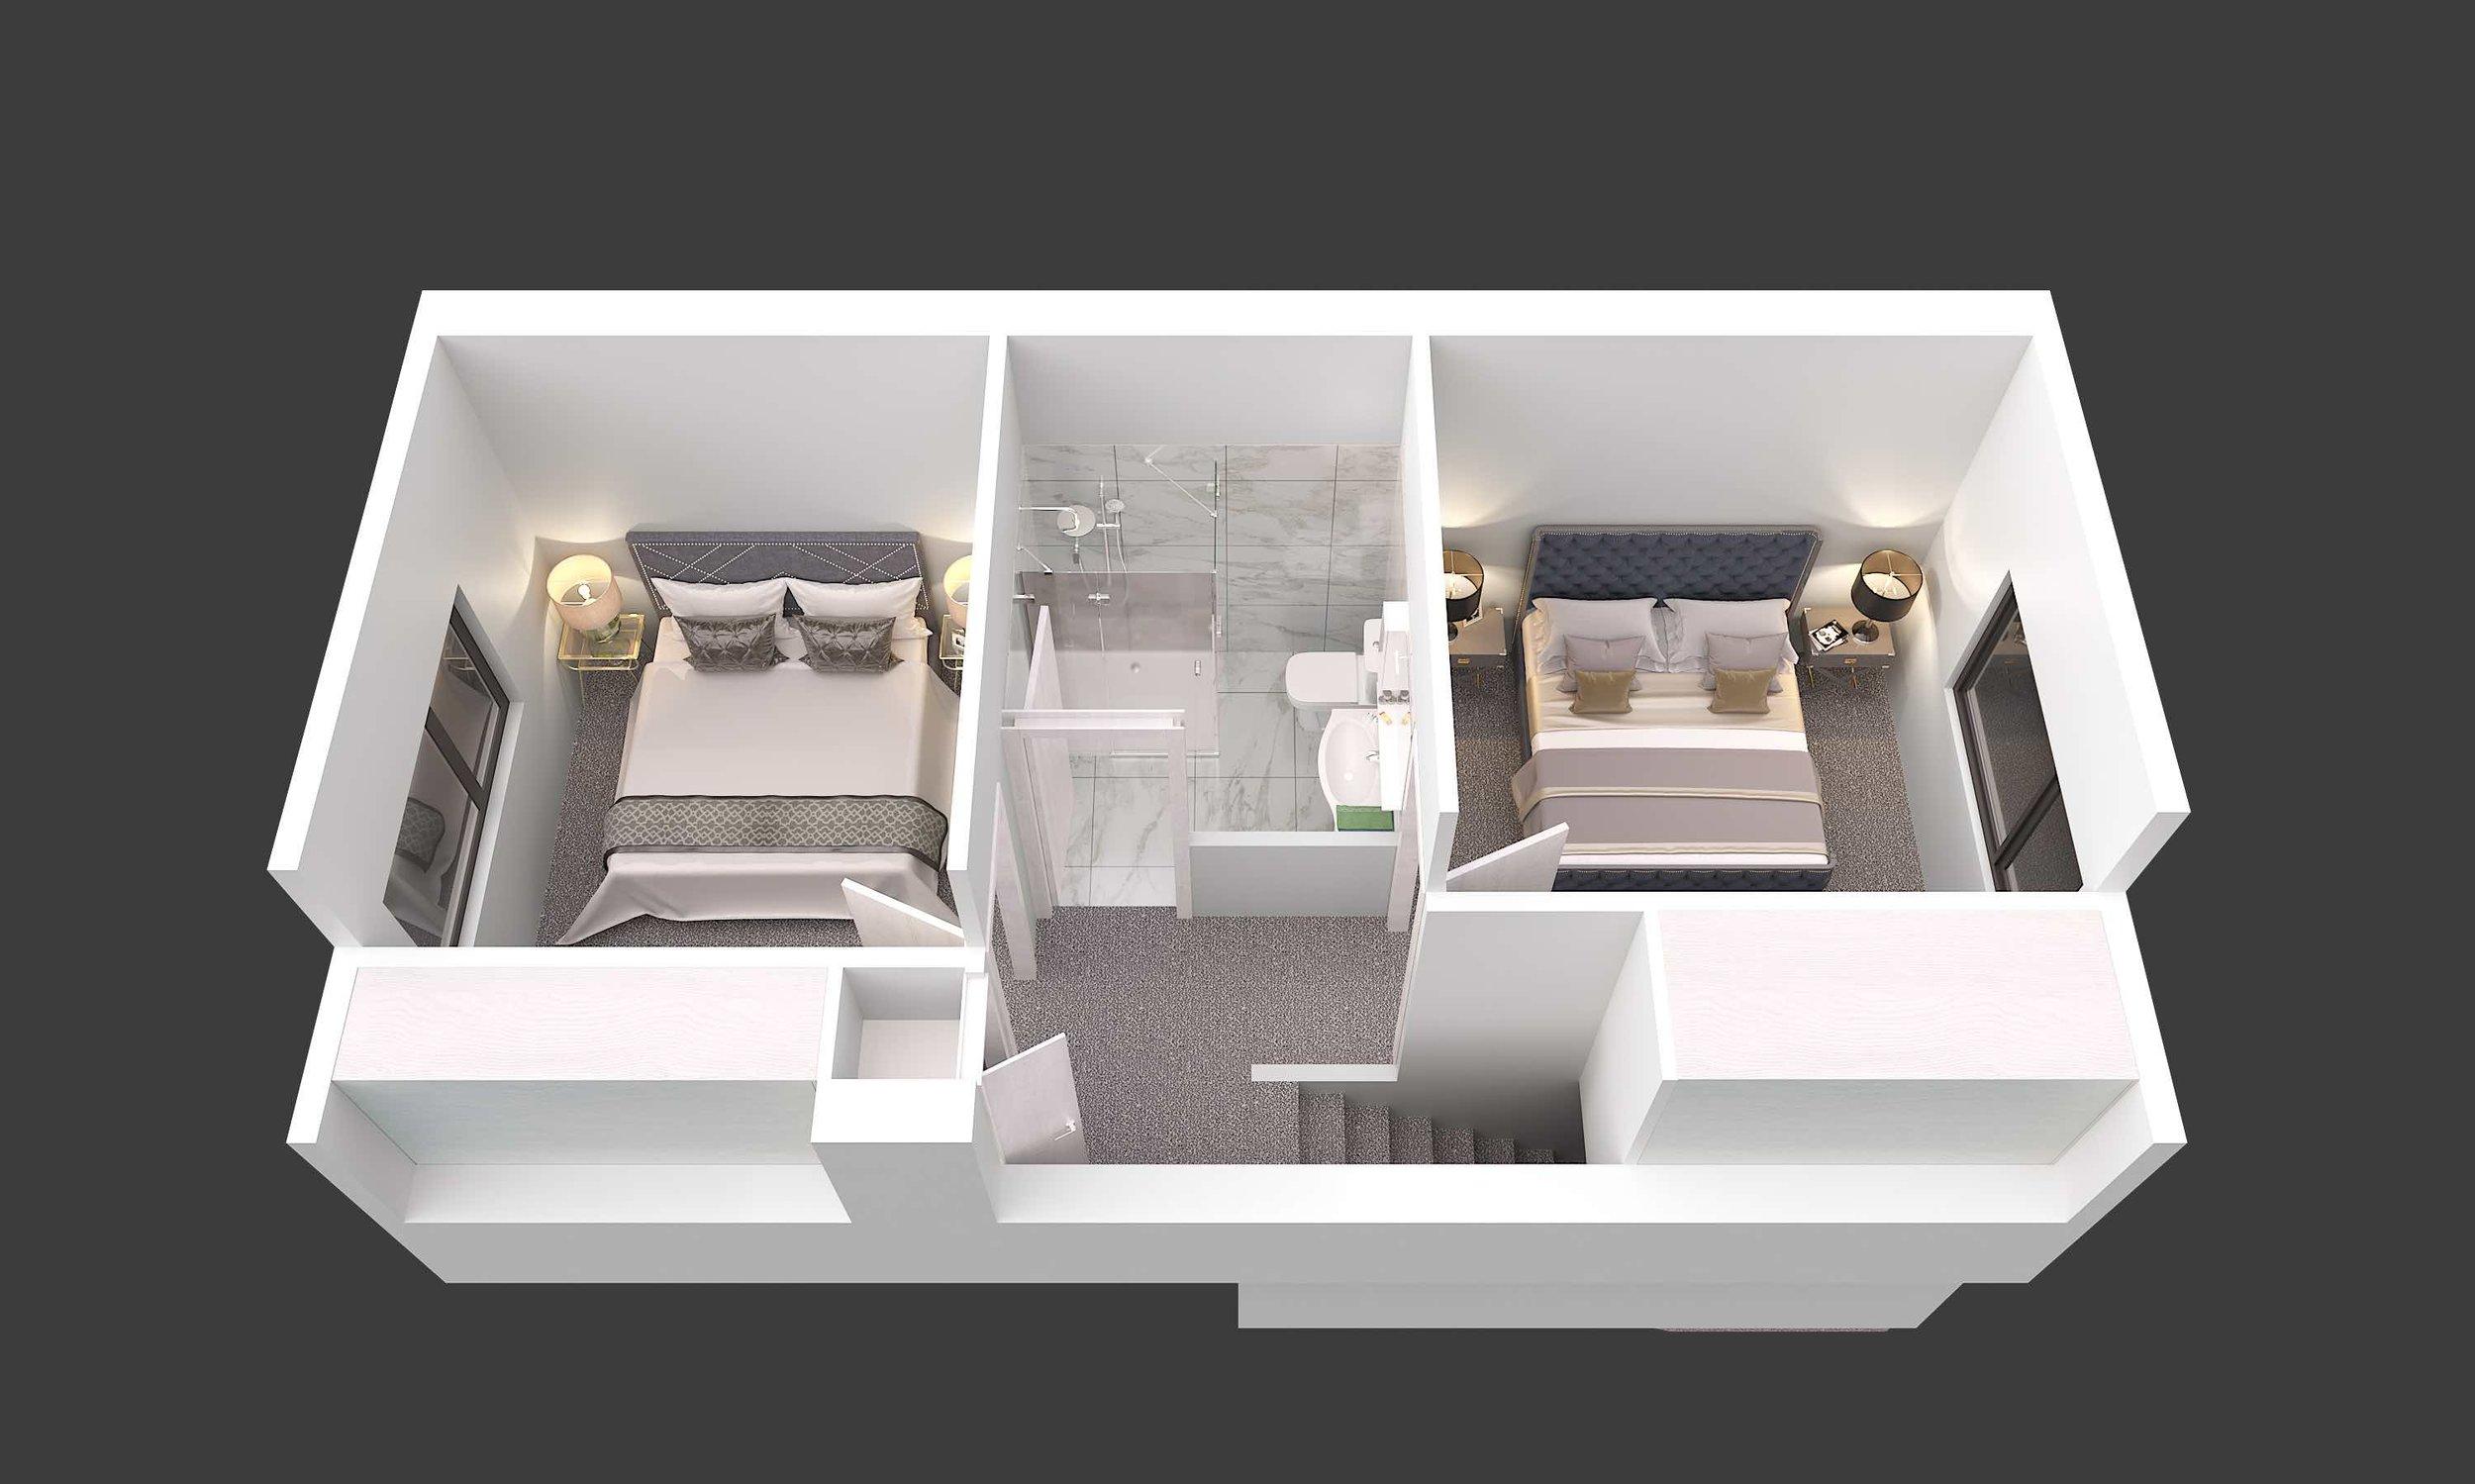 Image-First Floor.jpg12 Freyberg Ave, Riccarton, Christchurch, TOWNHOUSES